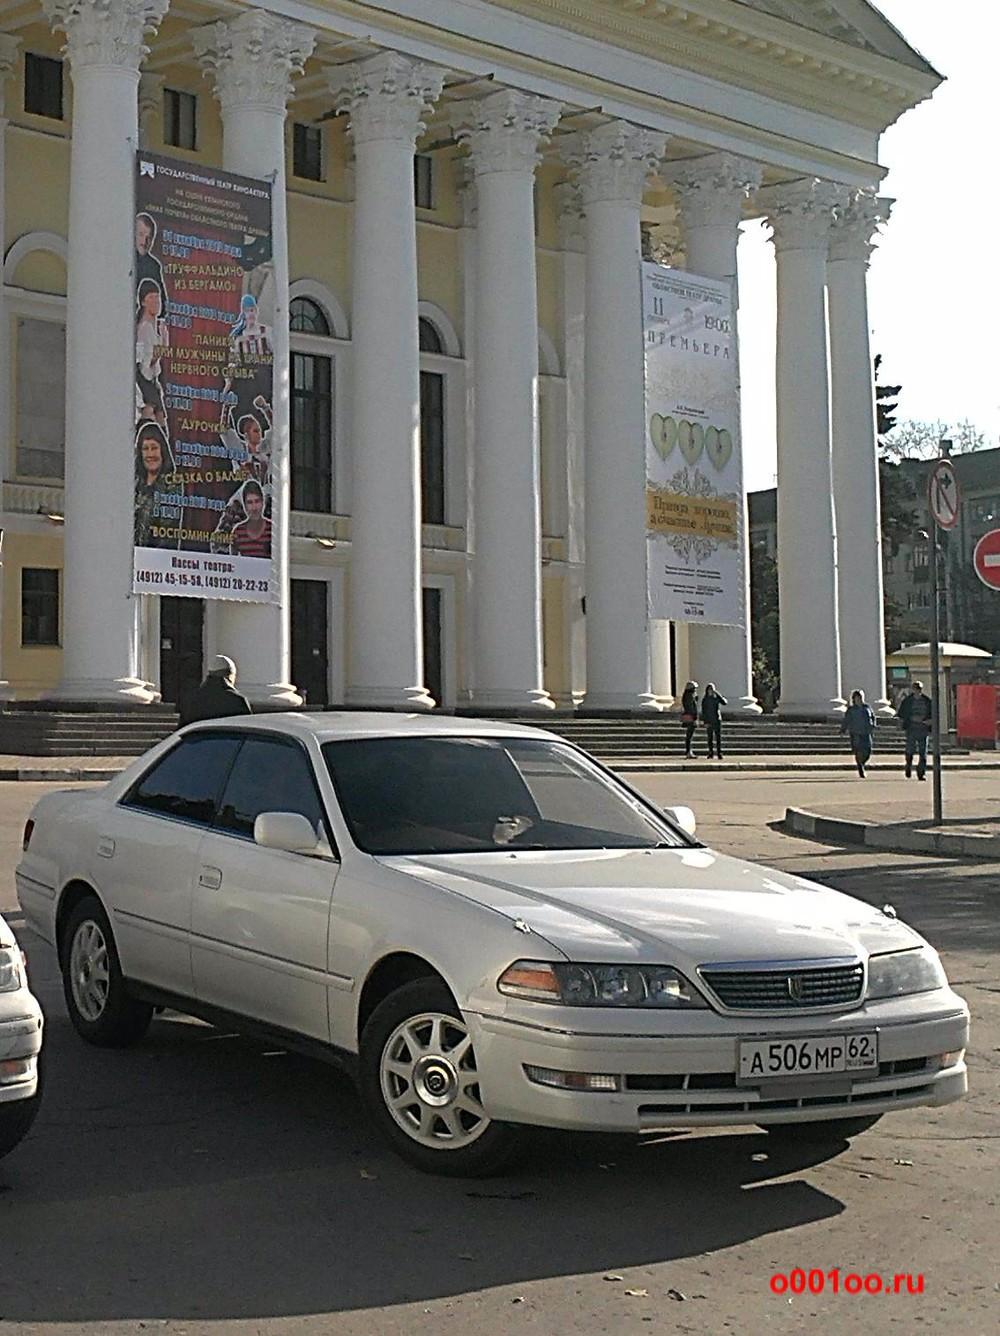 а506мр62